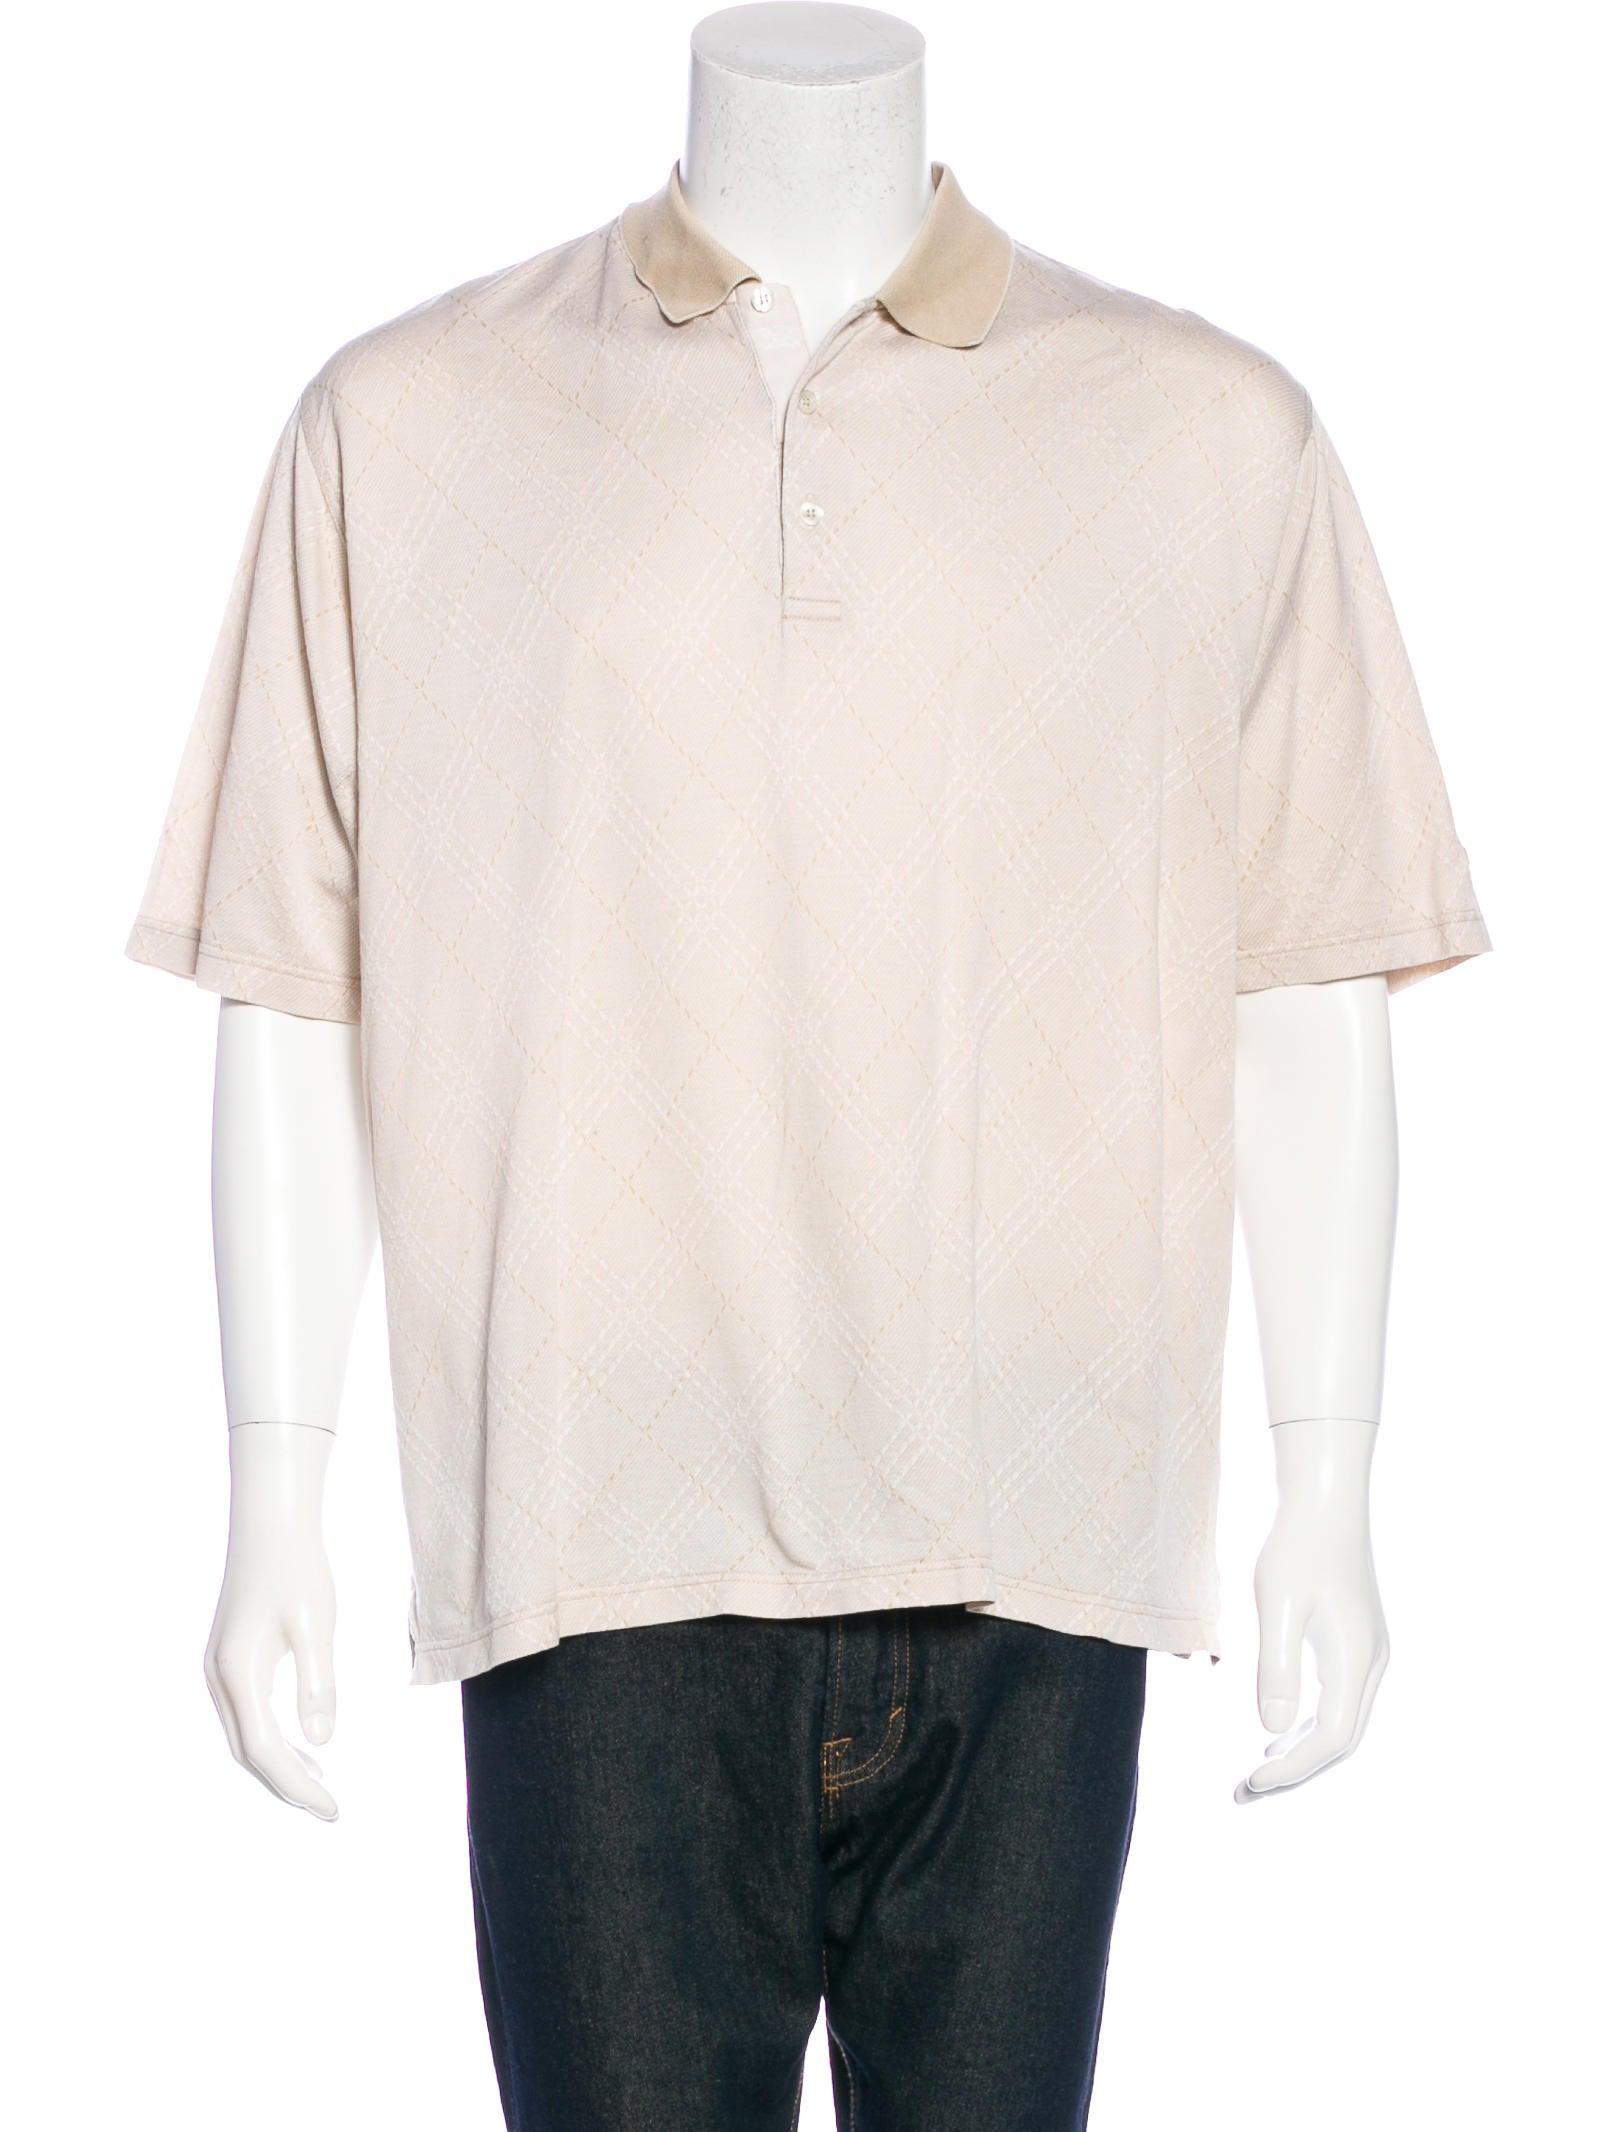 burberry golf polo shirt clothing bur72083 the realreal